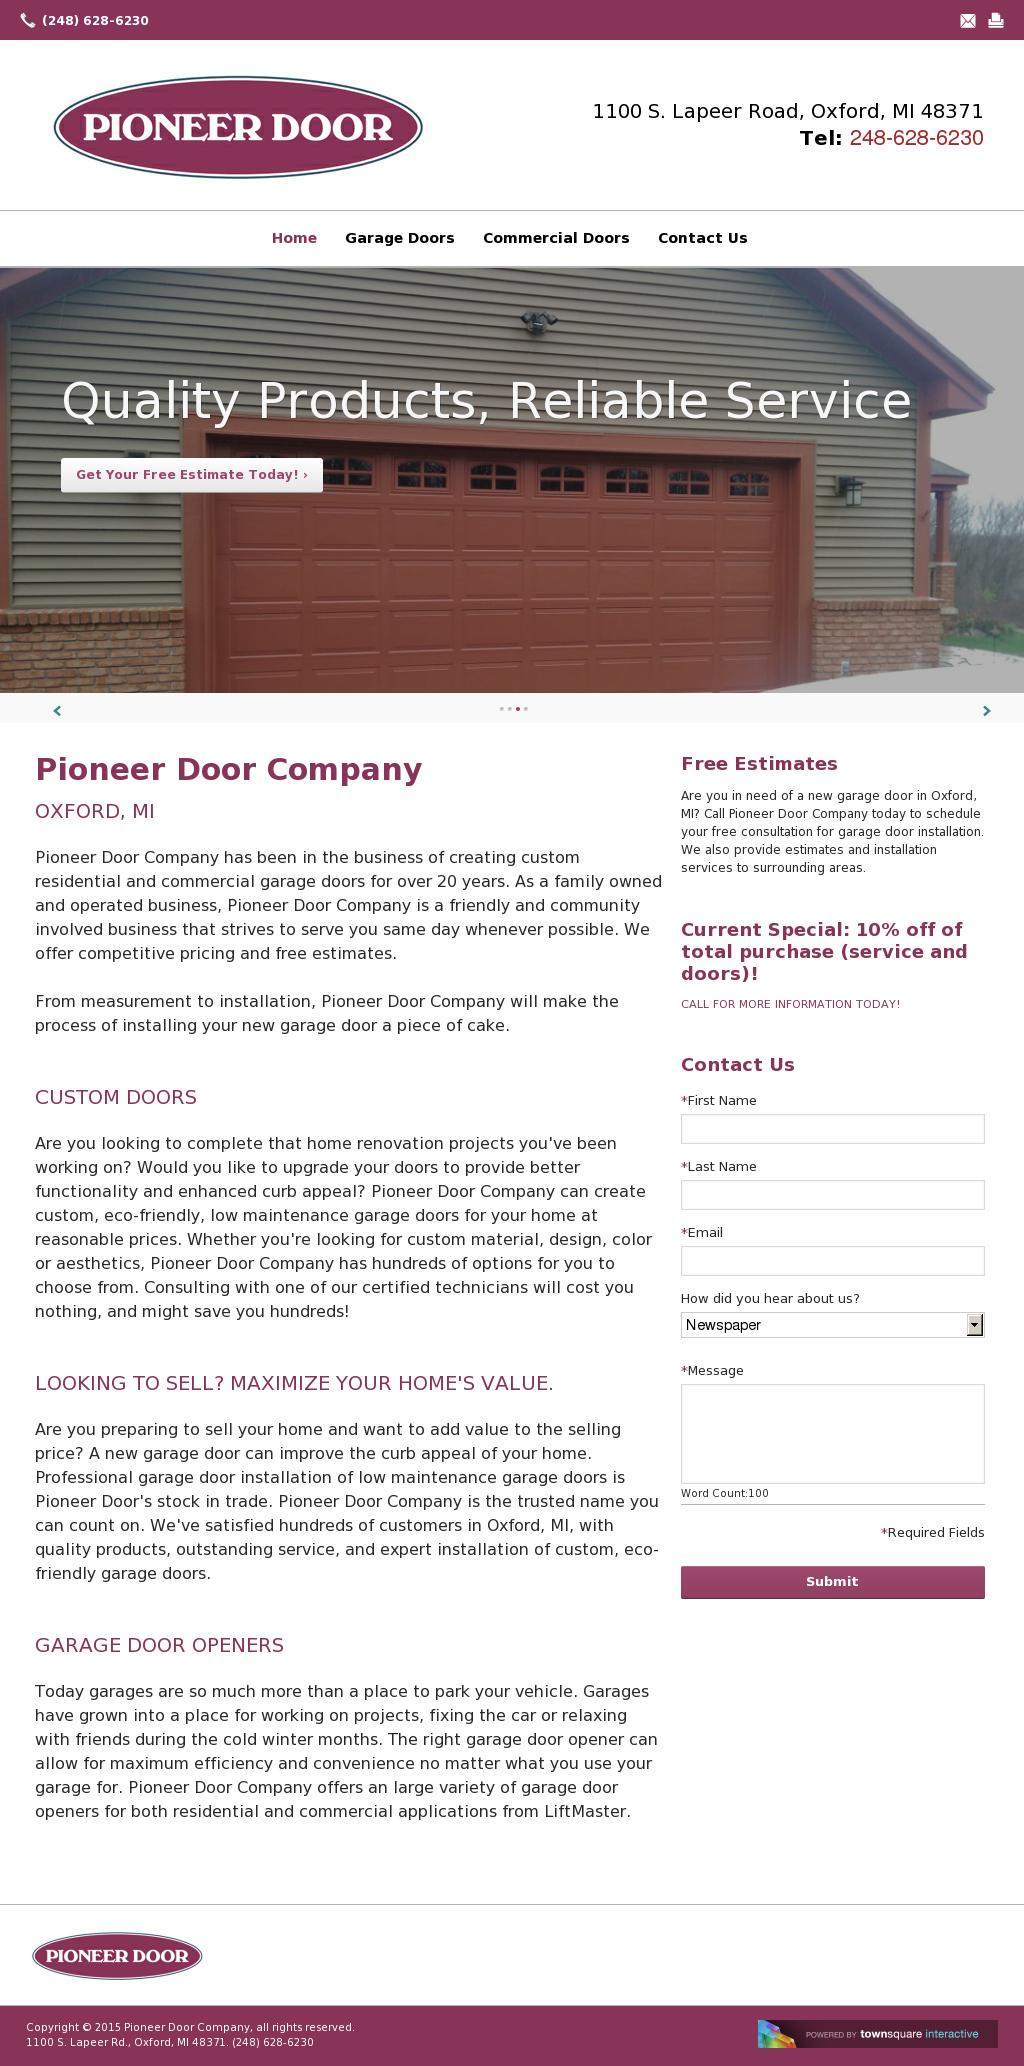 Pioneer Door Co Competitors, Revenue And Employees   Owler Company Profile